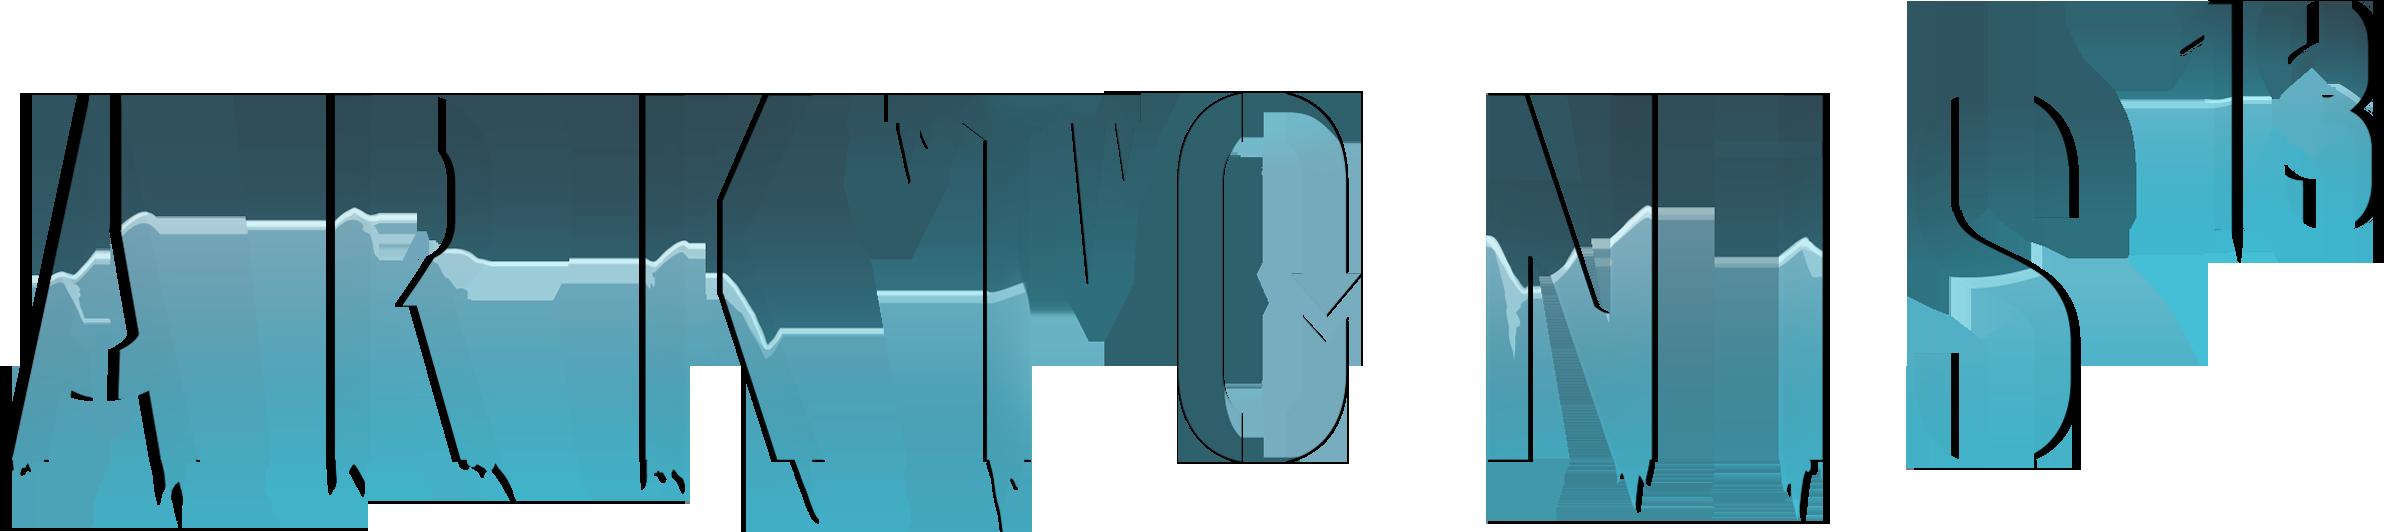 Arktonis 13